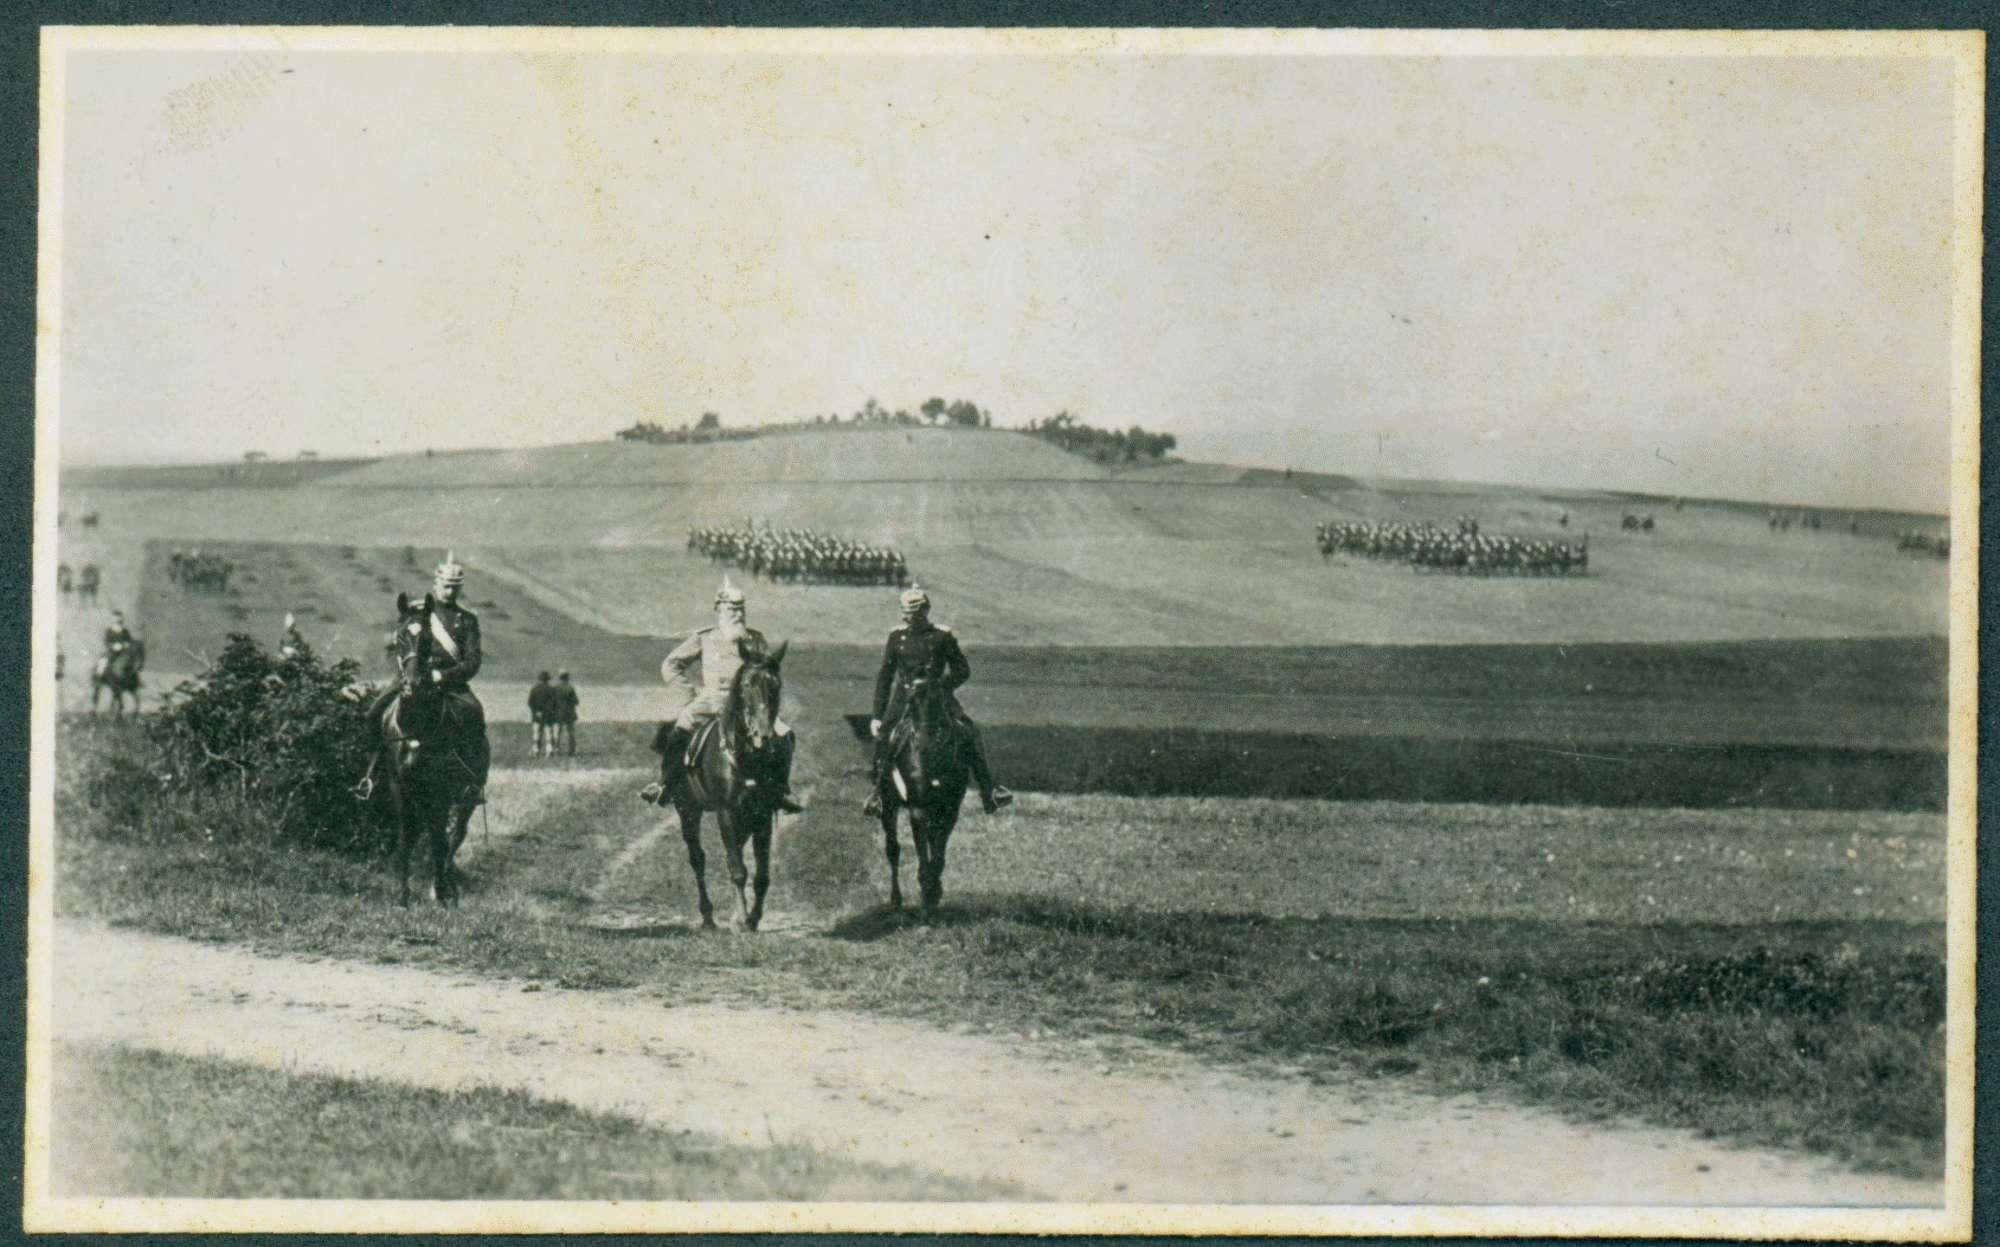 Großherzog Friedrich I. zu Pferd auf Manöverfeld., Bild 1